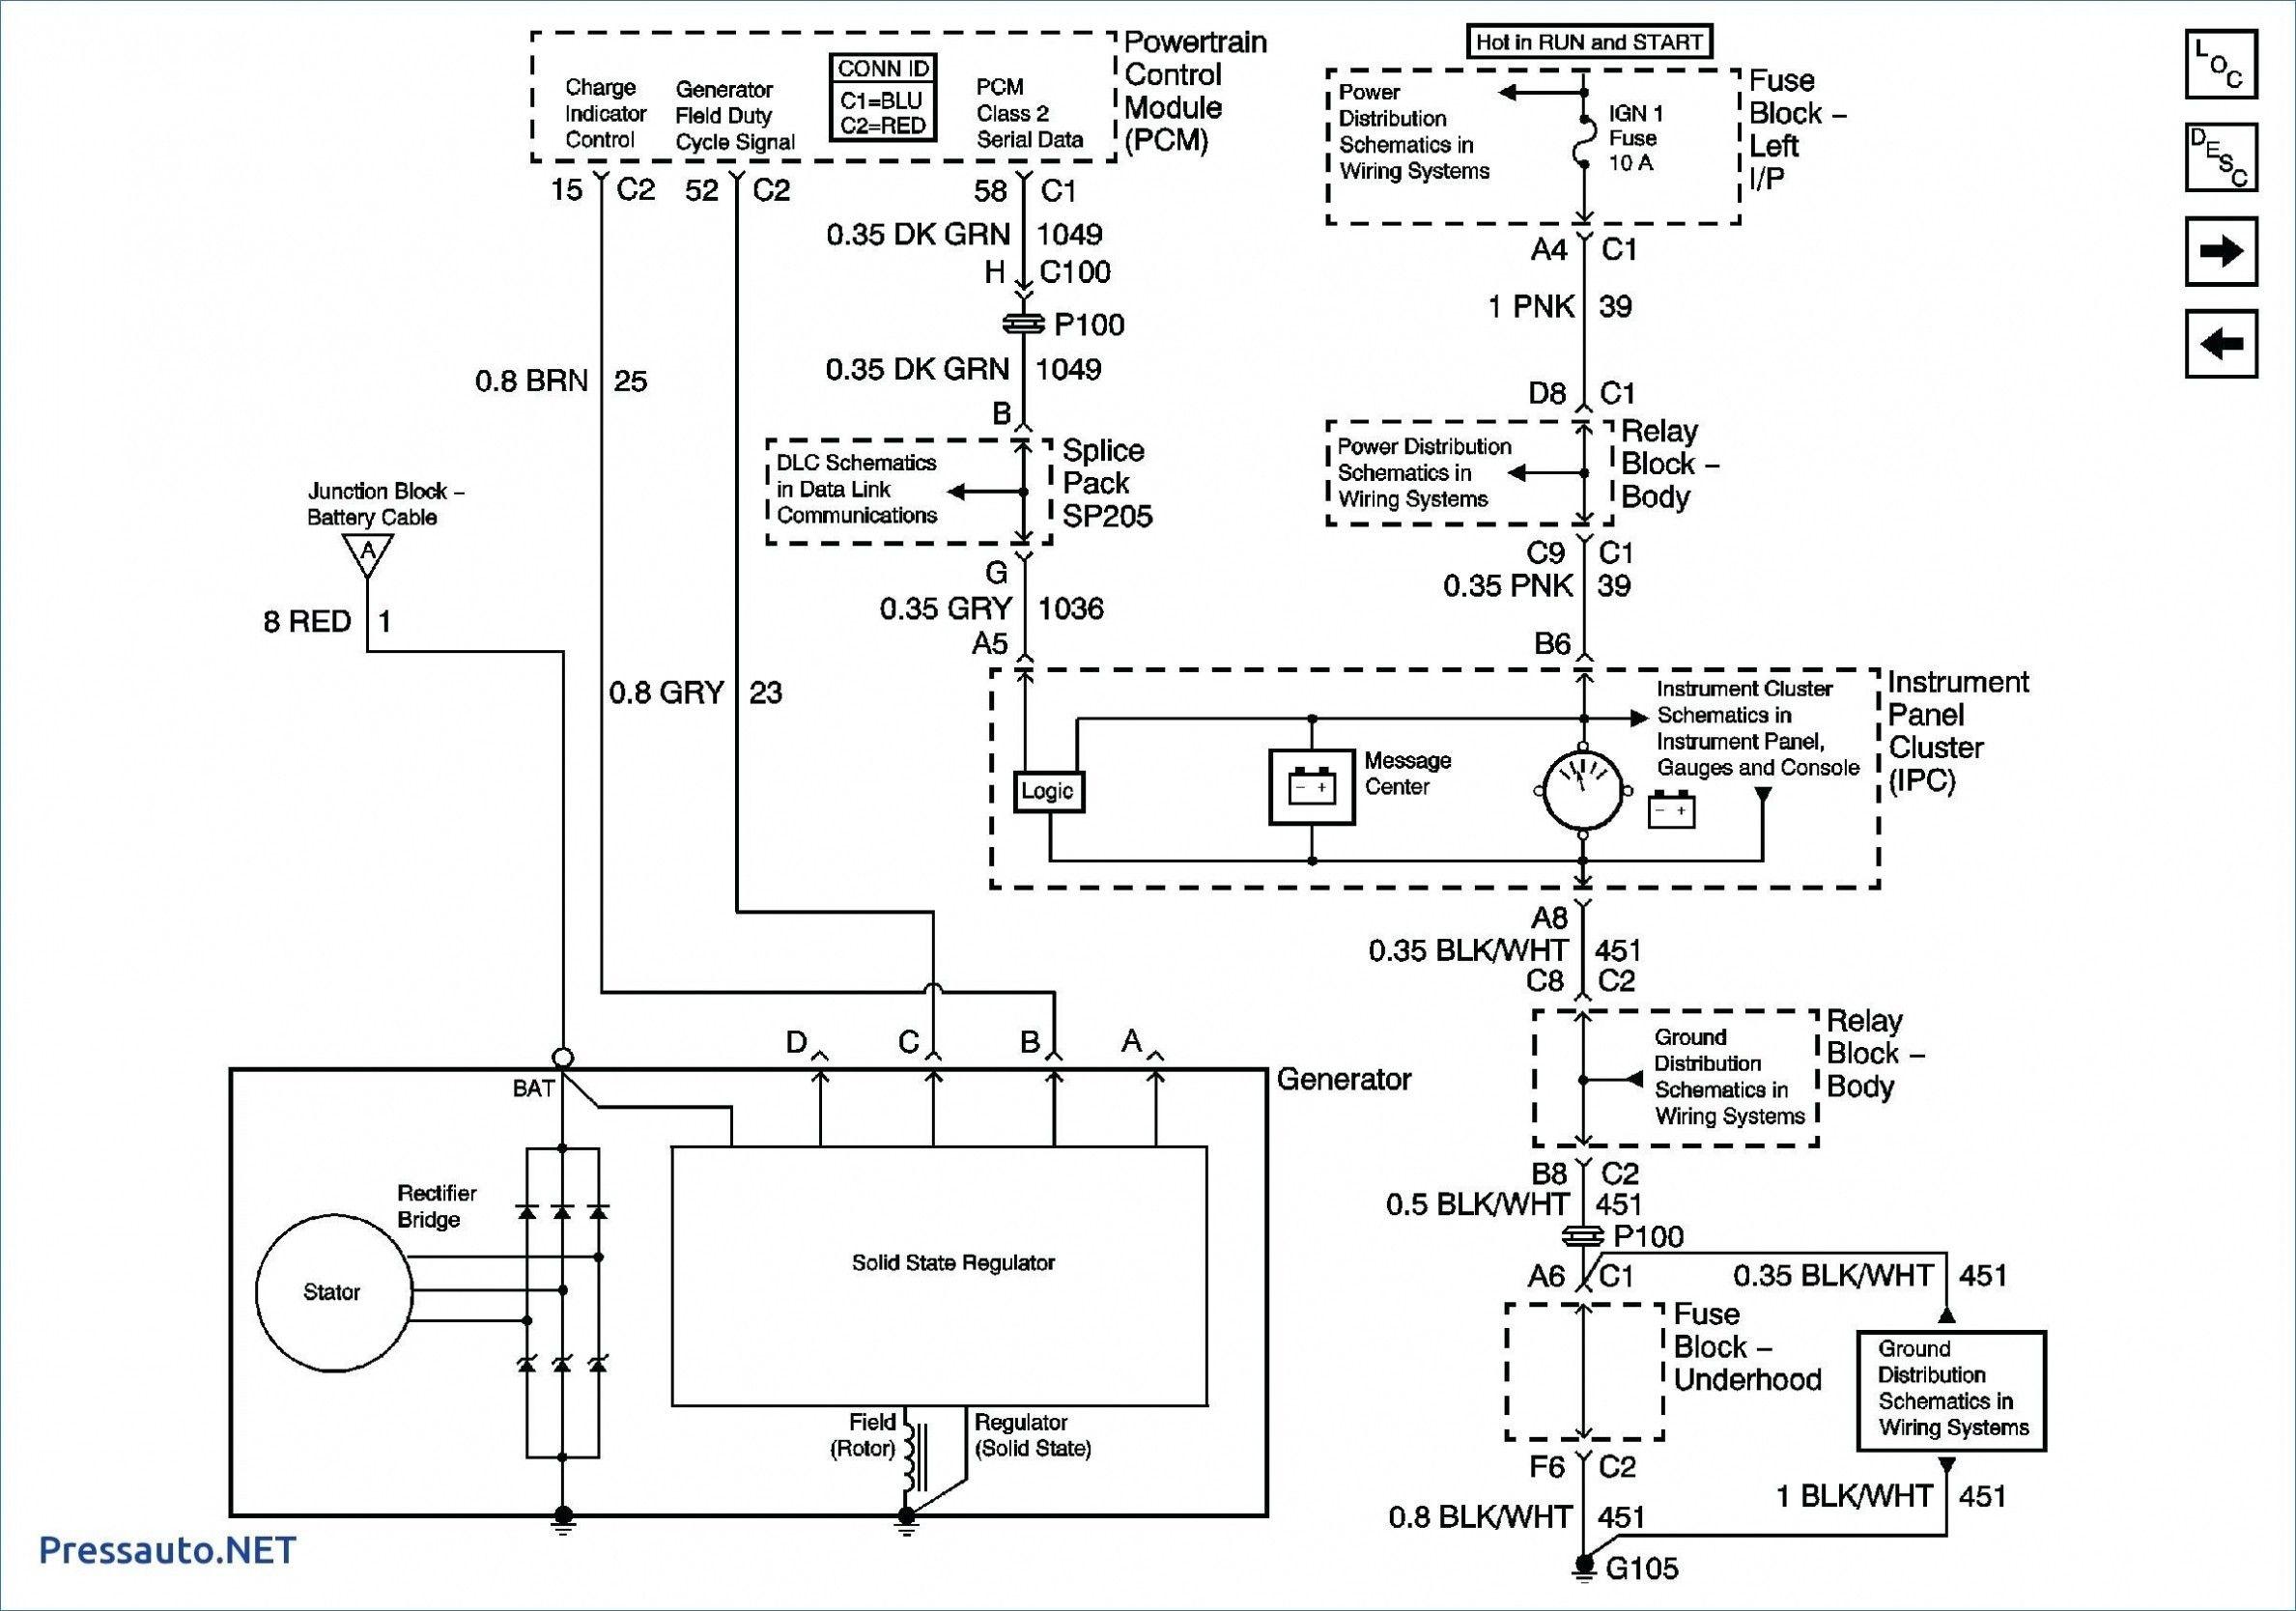 Fresh Proform Alternator Wiring Diagram Diagrams Digramssample Diagramimages Wiringdiagramsample Wiringdiagra Electrical Wiring Diagram Diagram Alternator